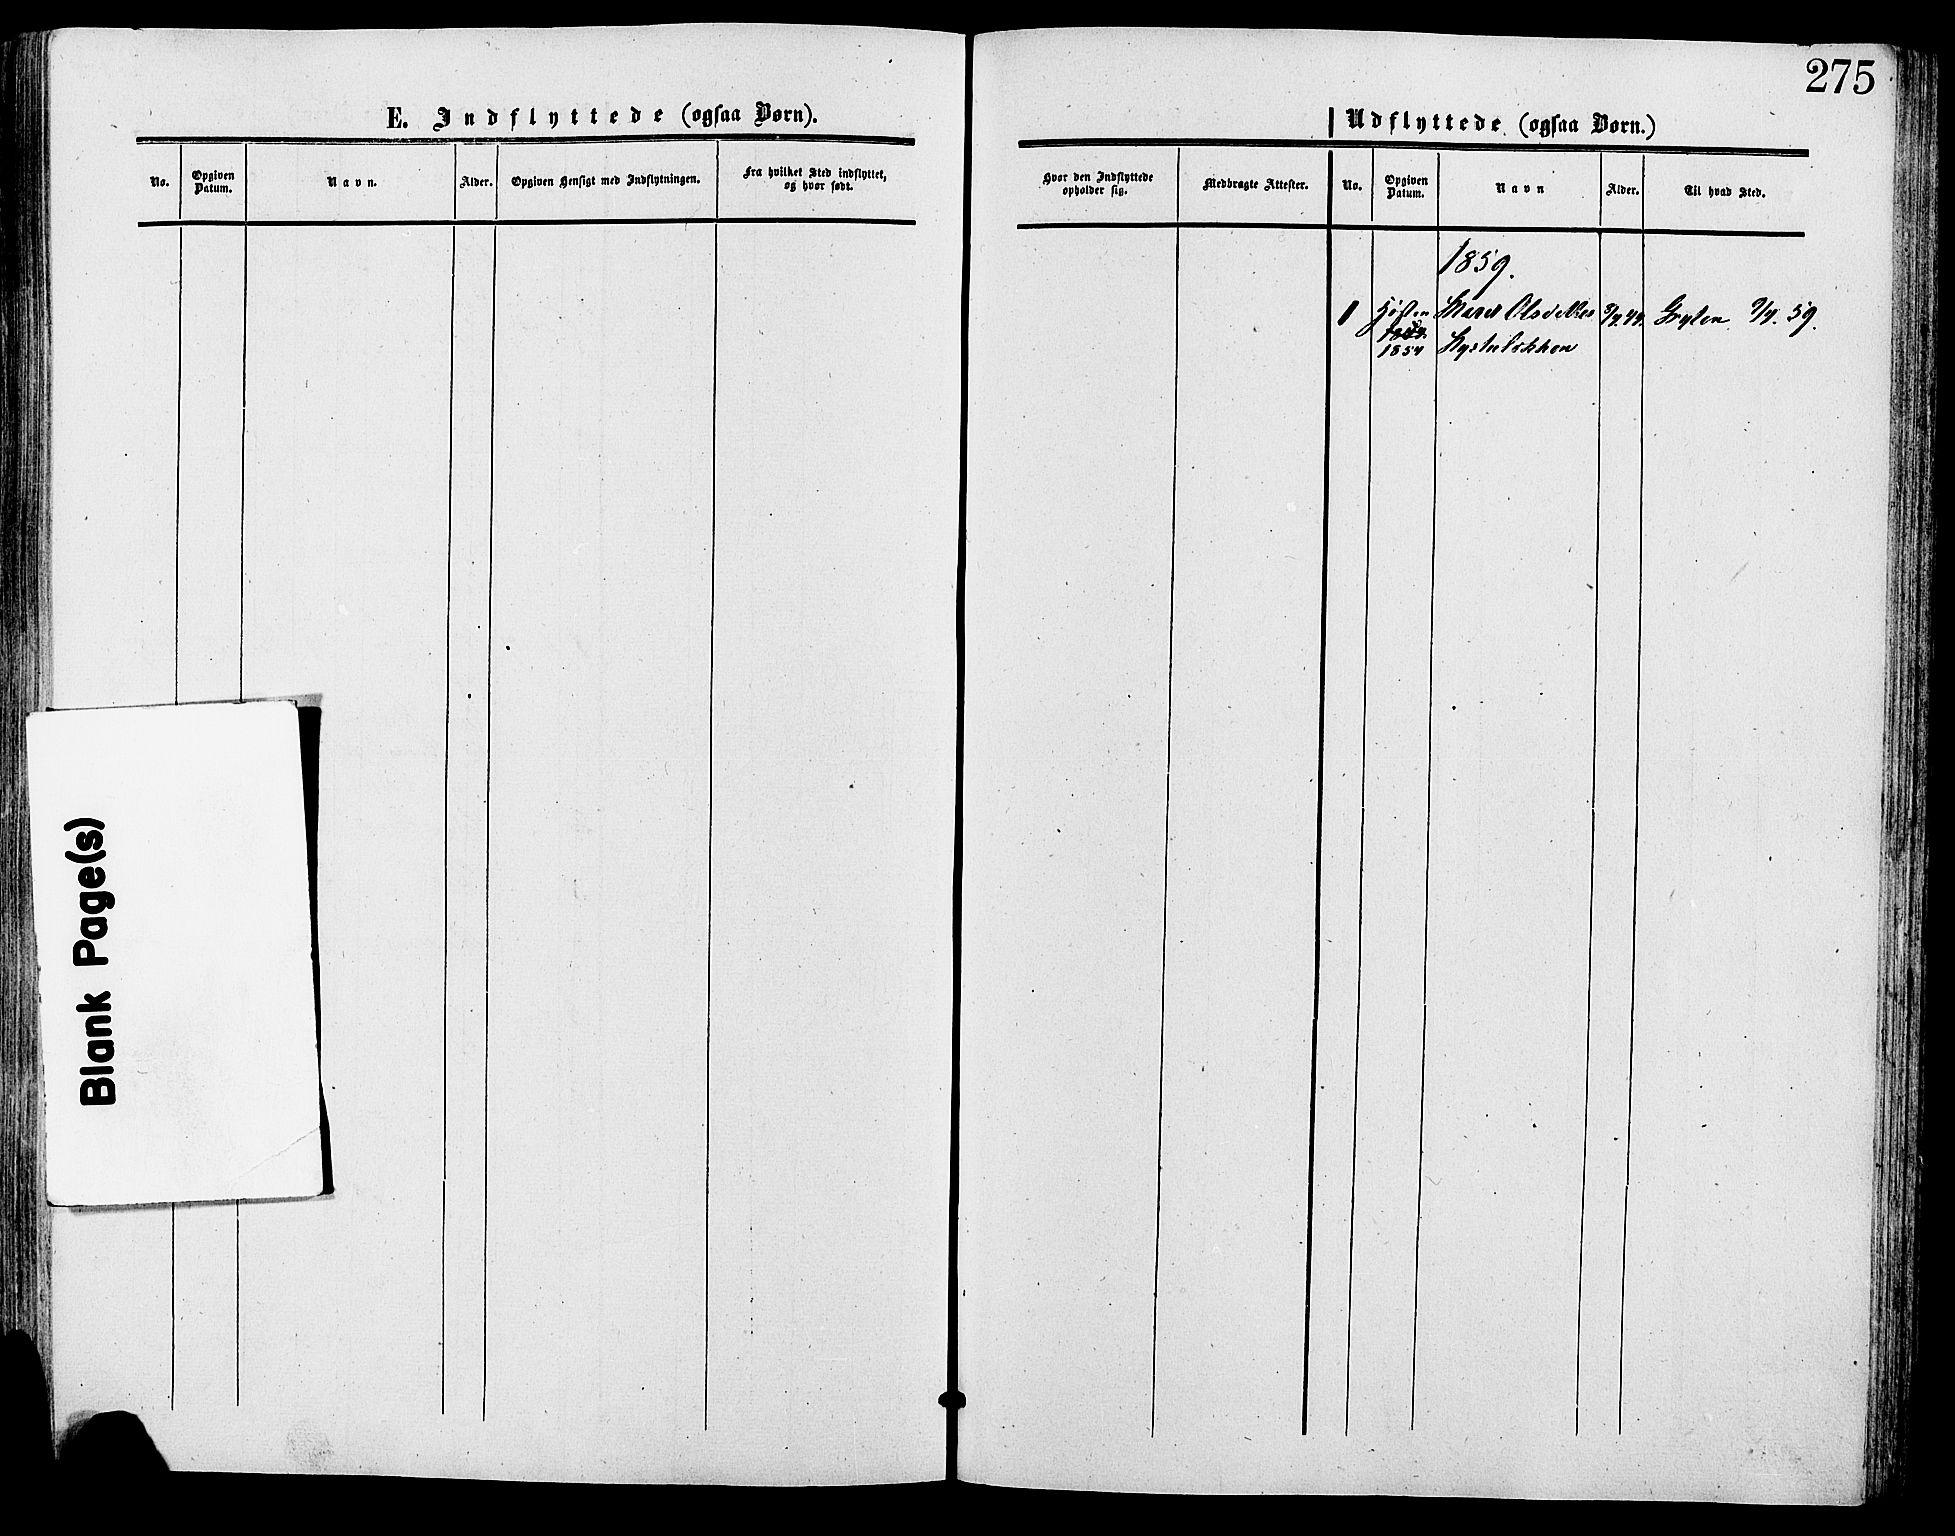 SAH, Lesja prestekontor, Ministerialbok nr. 9, 1854-1889, s. 275